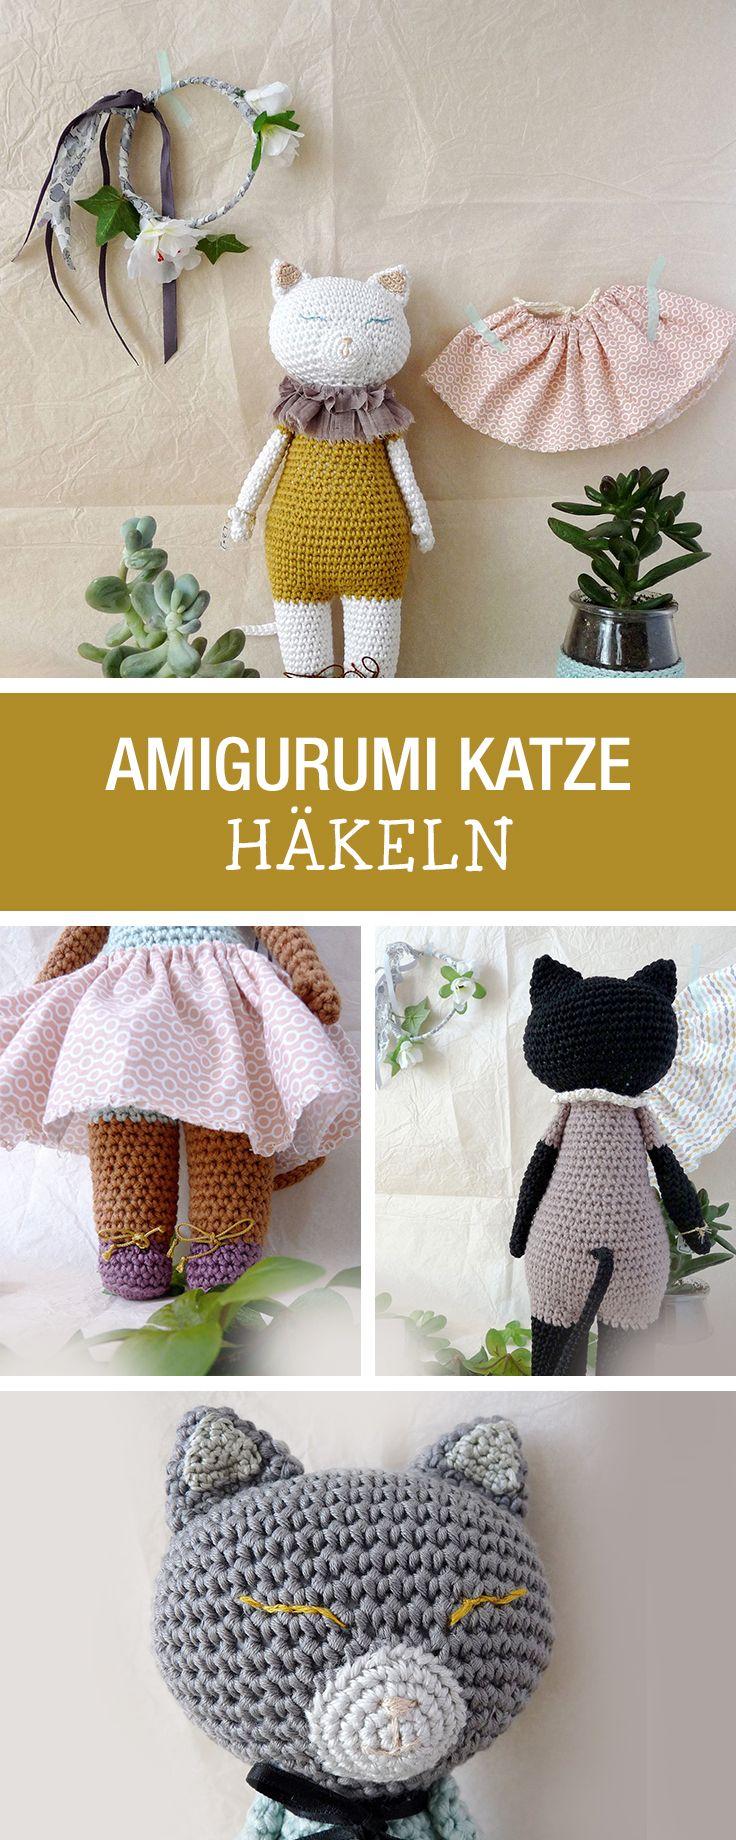 DIY-Anleitung: süße Amigurumi Katze häkeln, niedliche Wohndeko für Katzenliebhaber / DIY tutorial: crocheting cutre amigurumi cat, sweet home decor for cat lovers via DaWanda.com